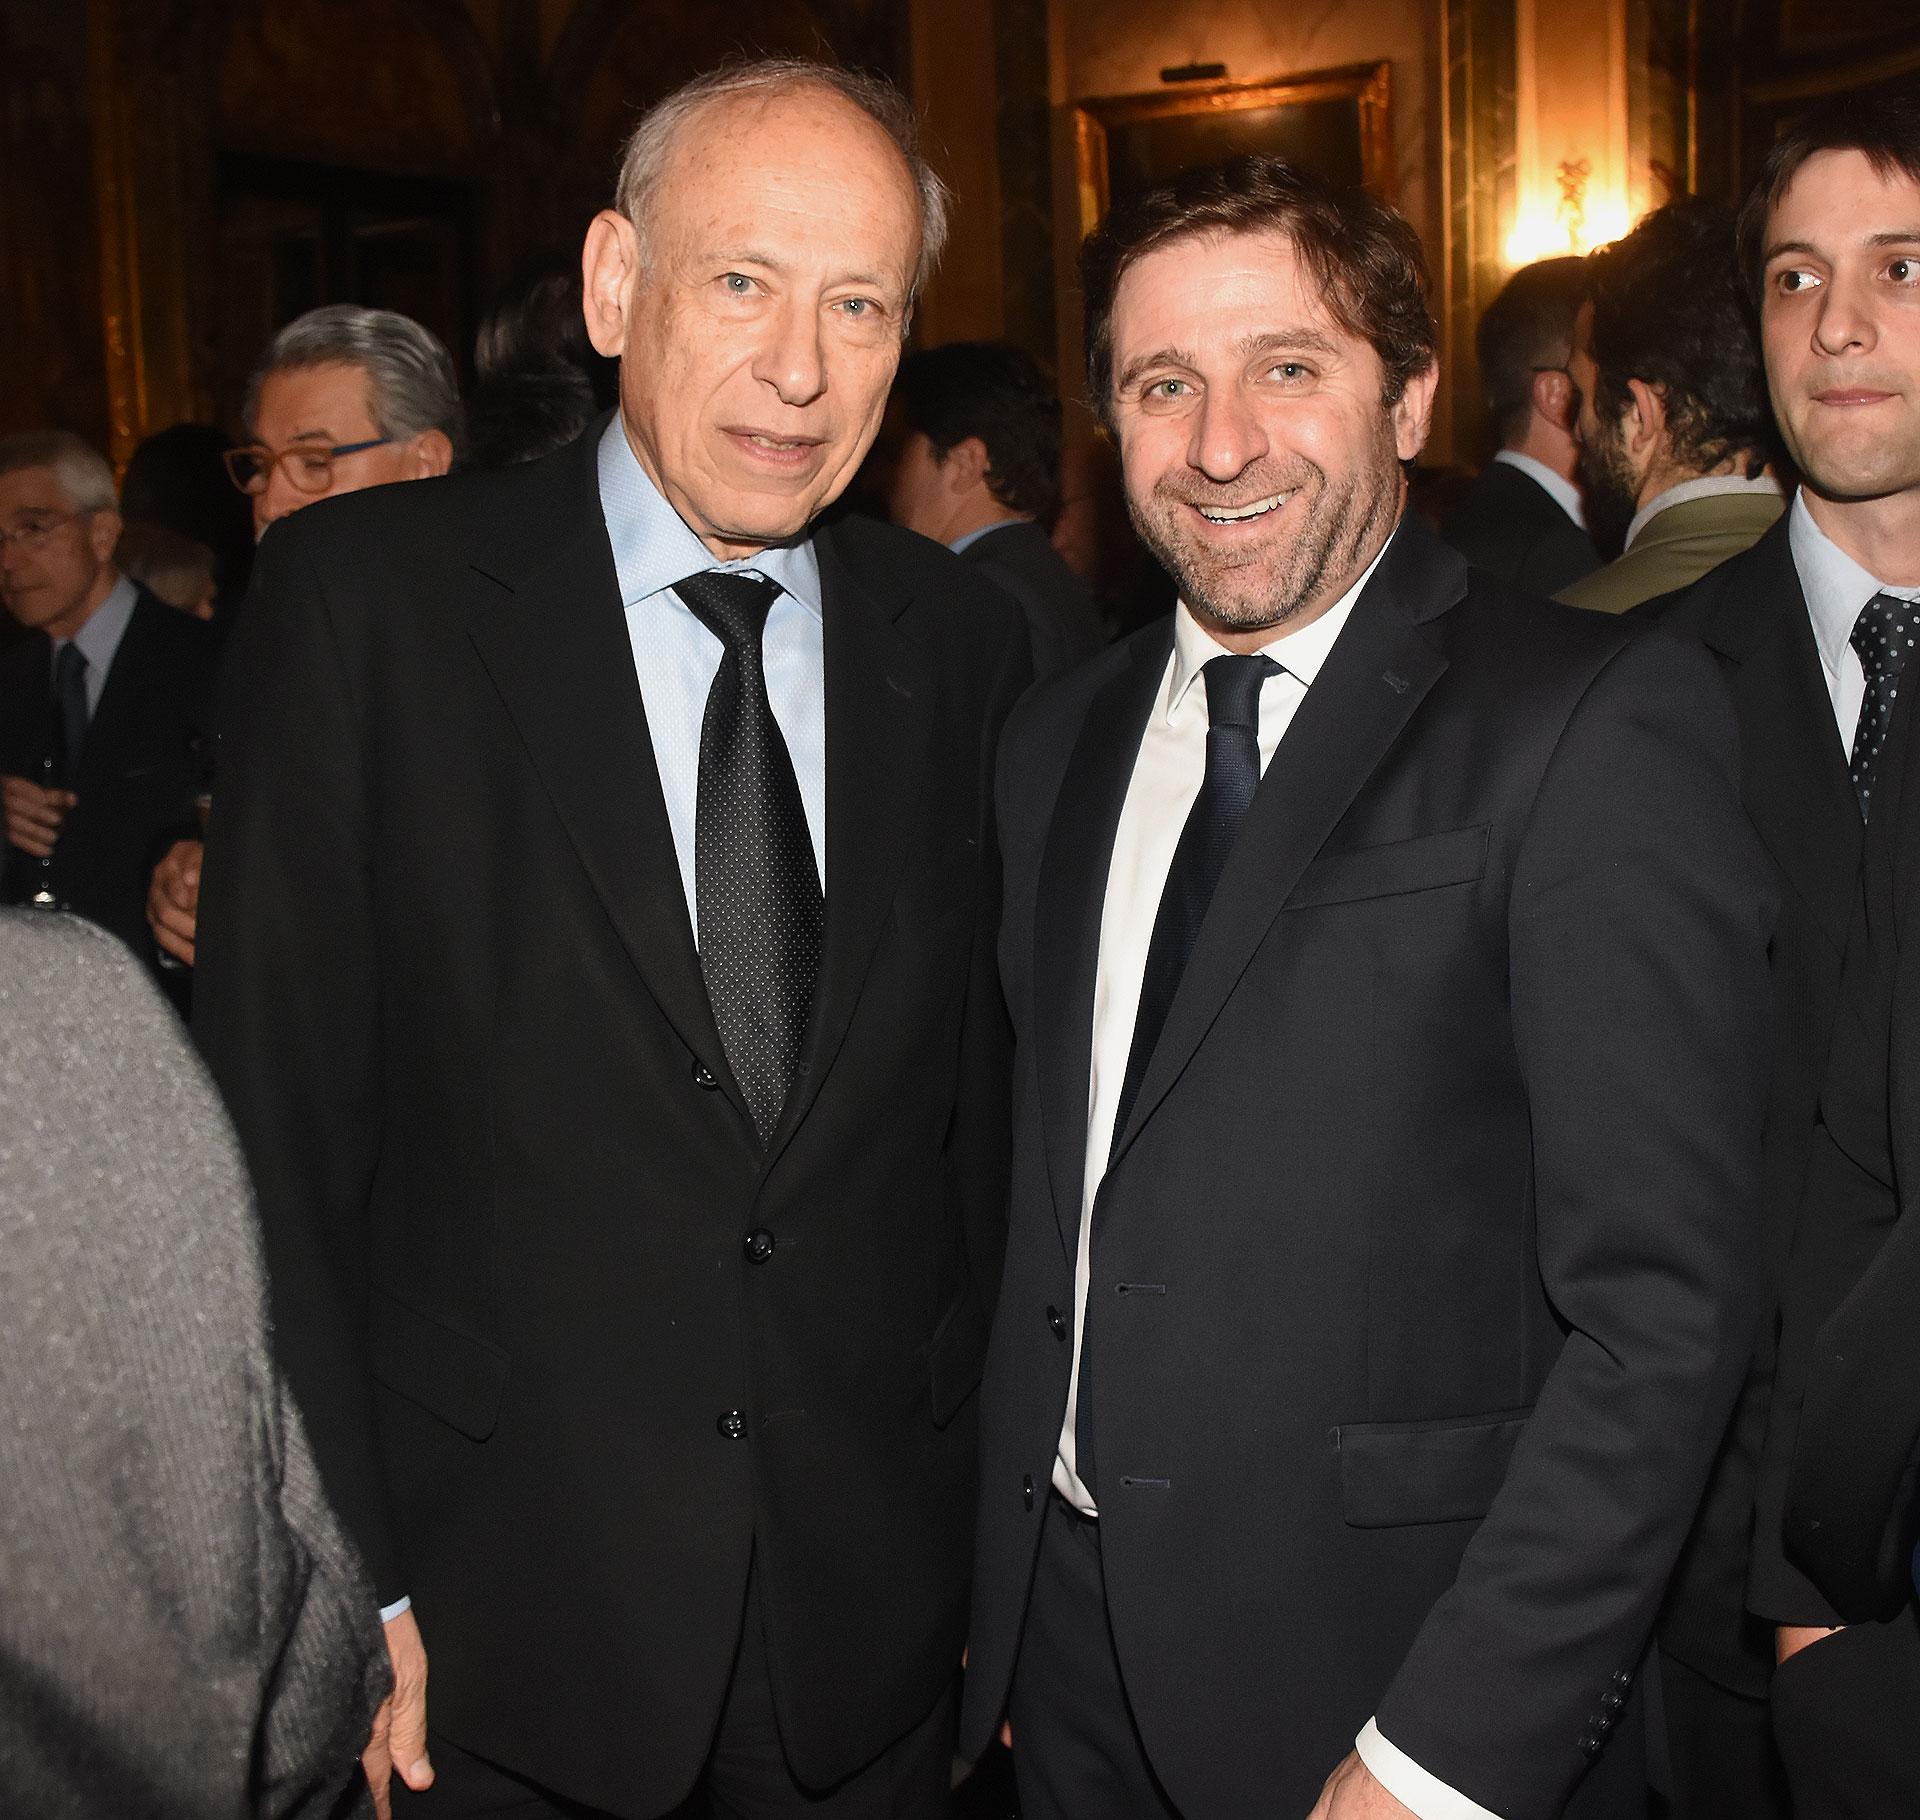 Luis Ovsejevich y Fernando Straface